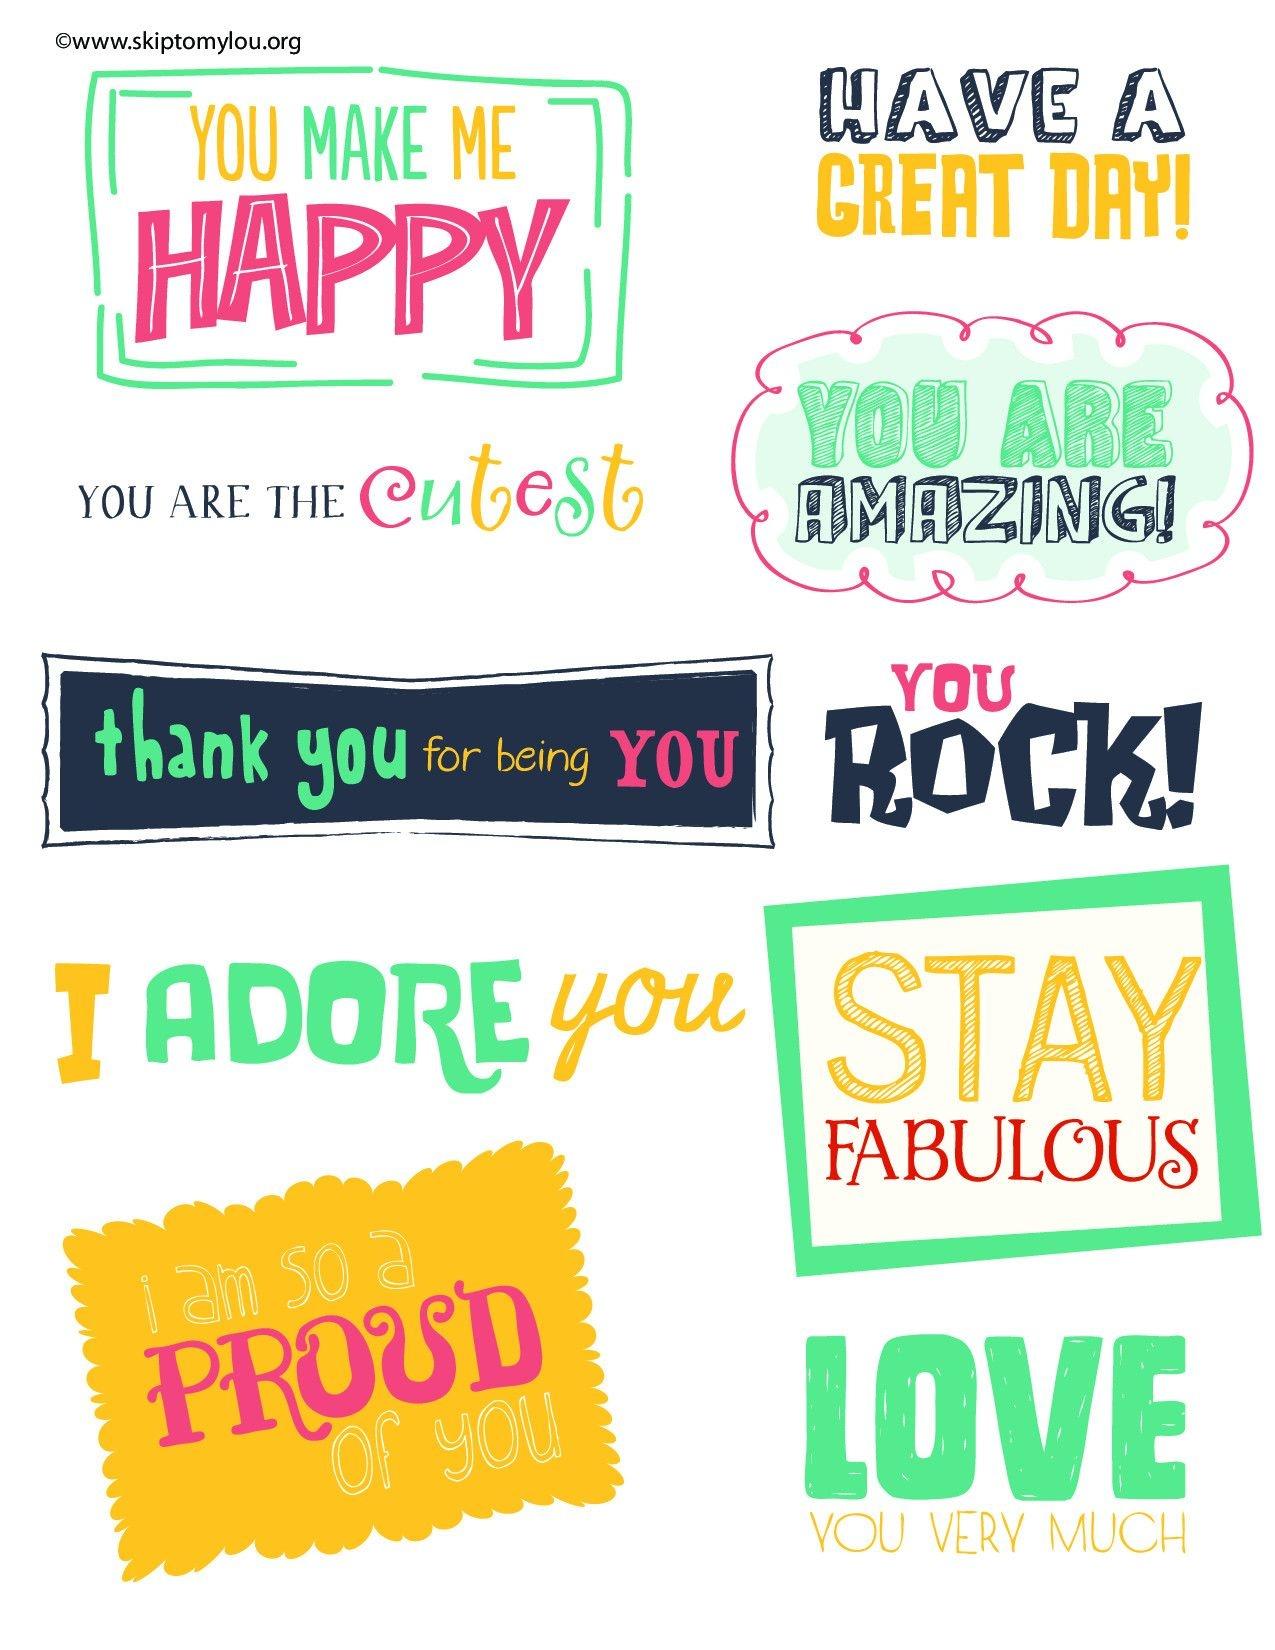 Kindness Cards {Free Printable}   Printables For Parents   Kindness - Free Printable Kindness Cards